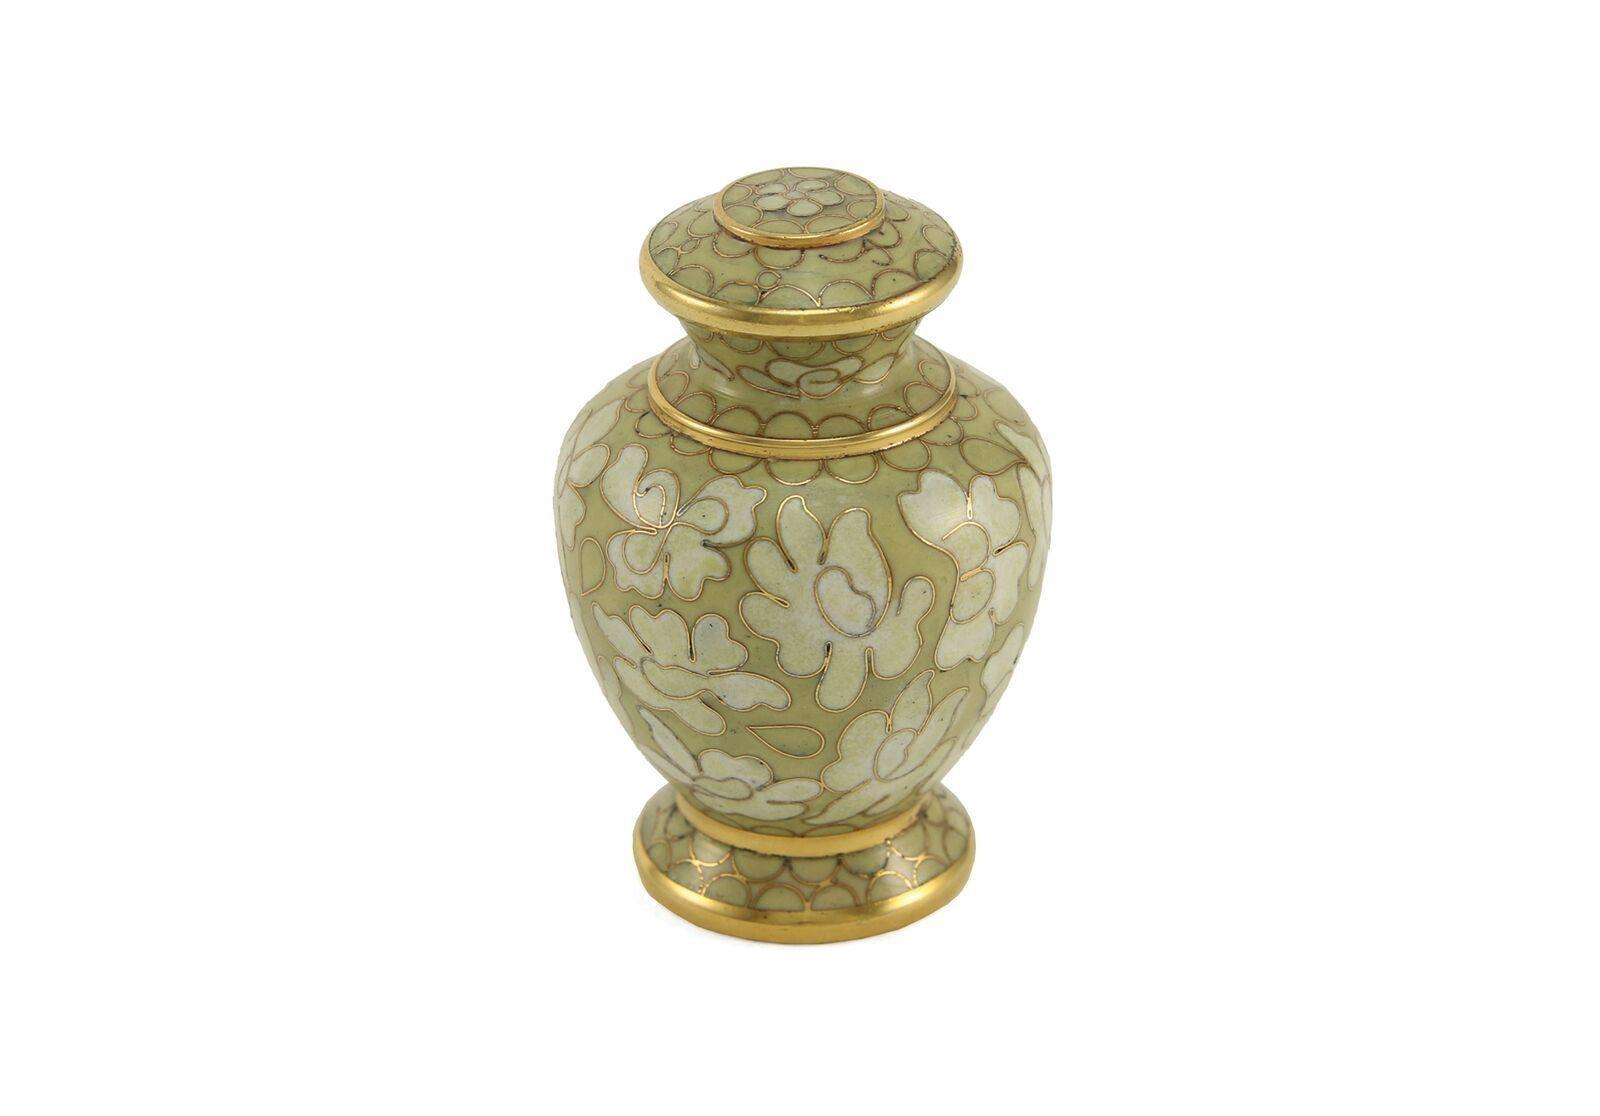 12 Stylish wholesale Urn Vases 2021 free download wholesale urn vases of essence opal individual keepsake with velvet bag cremation urn with essence opal individual keepsake with velvet bag cremation urn